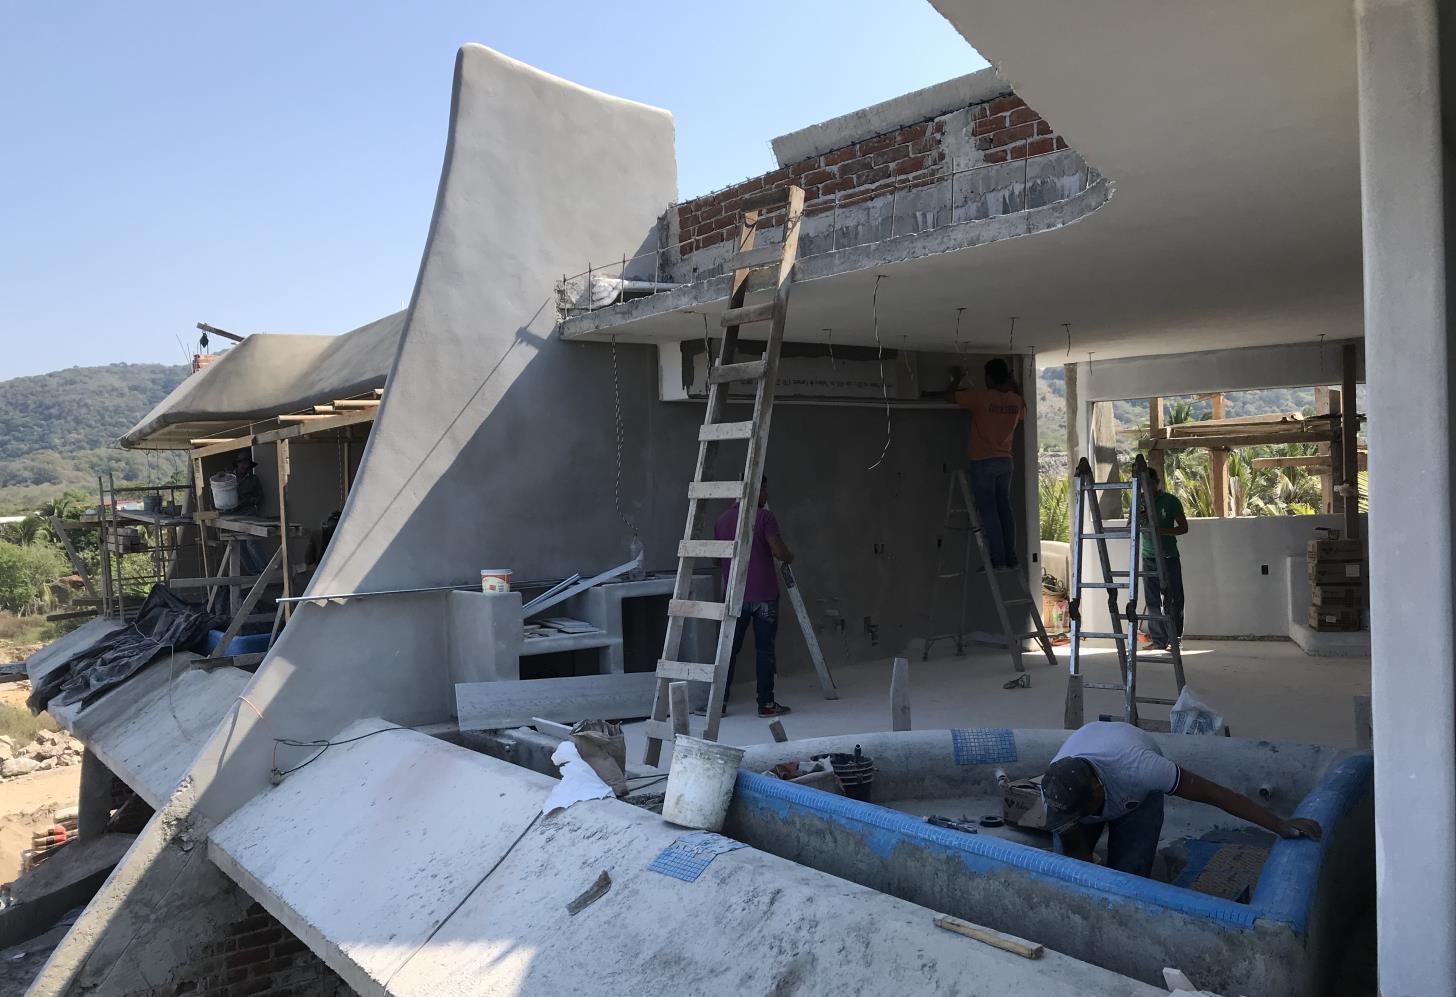 REPORTE-FOTOGRAFICO-PUNTA-MAJAHUA-08-DE-ENERO-DEL-2018-031.jpg